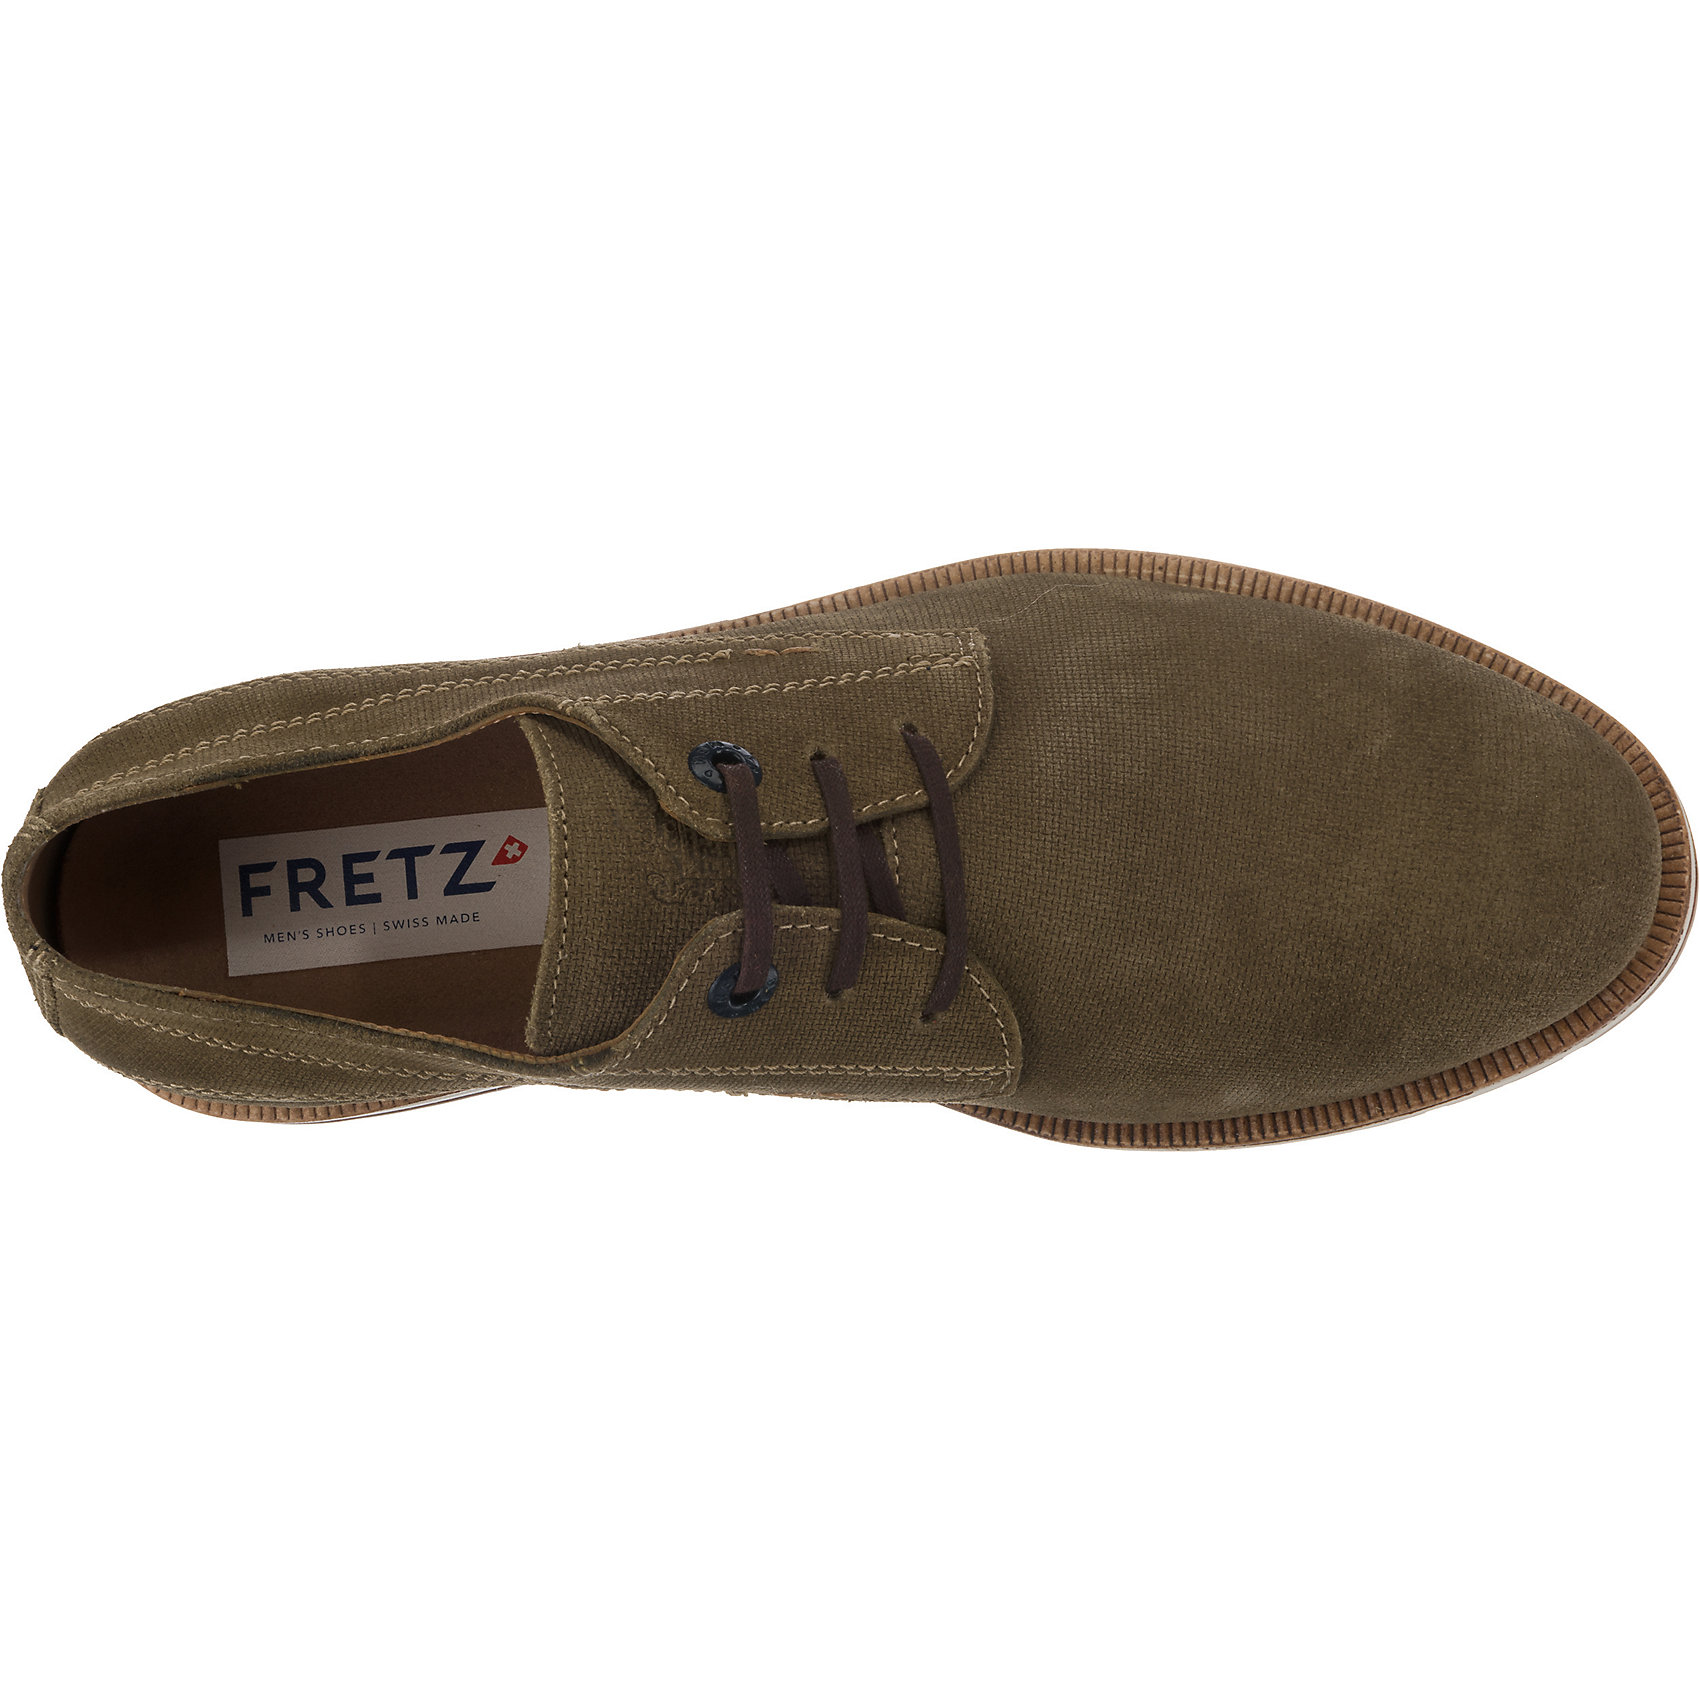 Neu FRETZ men Steven Freizeit Schuhe 7229326 für Herren beige dunkelblau